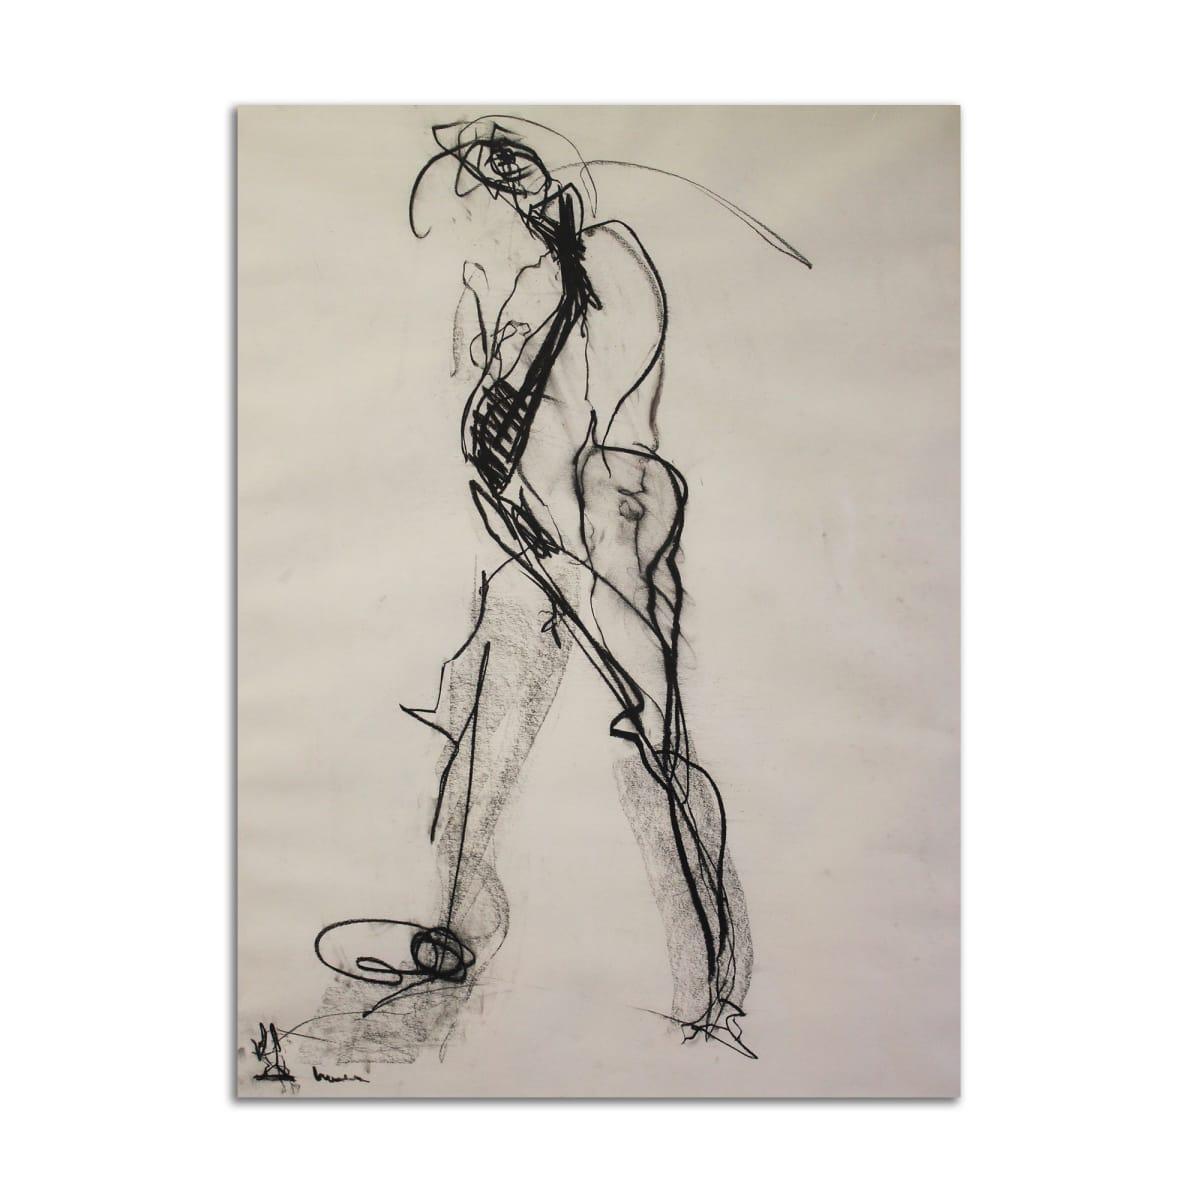 Black & White Drawing by Stephanie Cramer